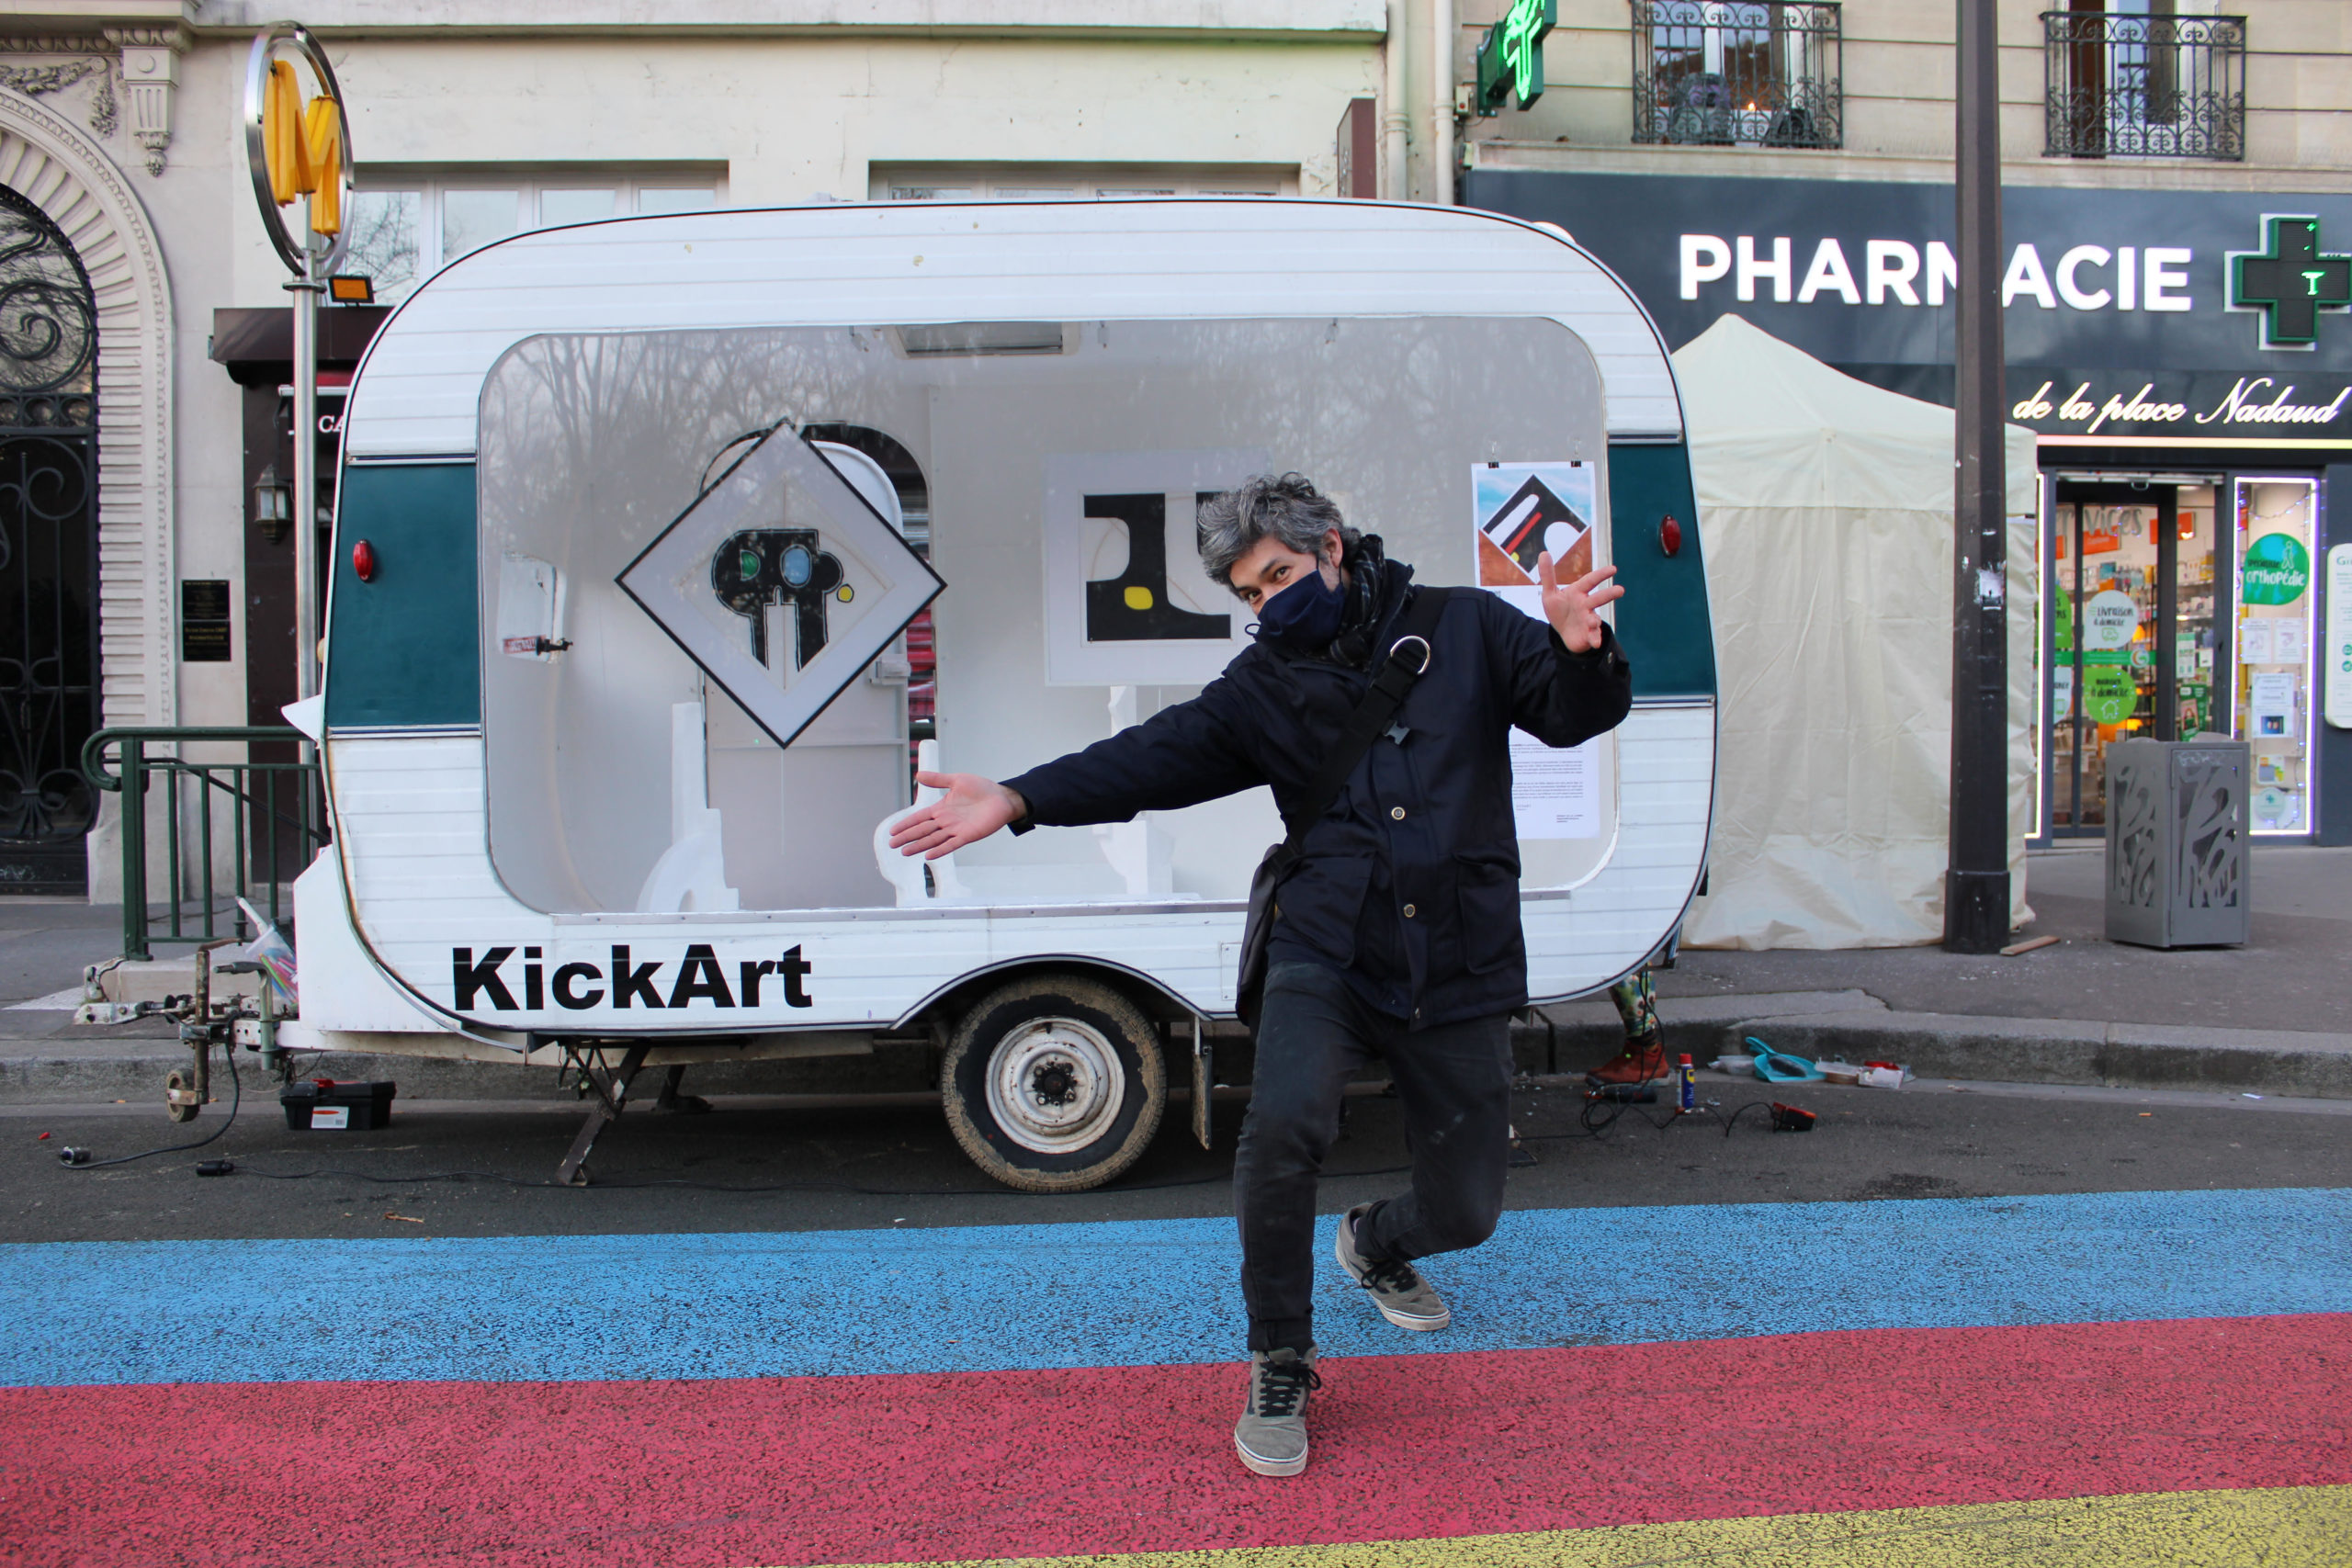 KickArt : une galerie d'art ambulante s'installe place Martin Nadaud